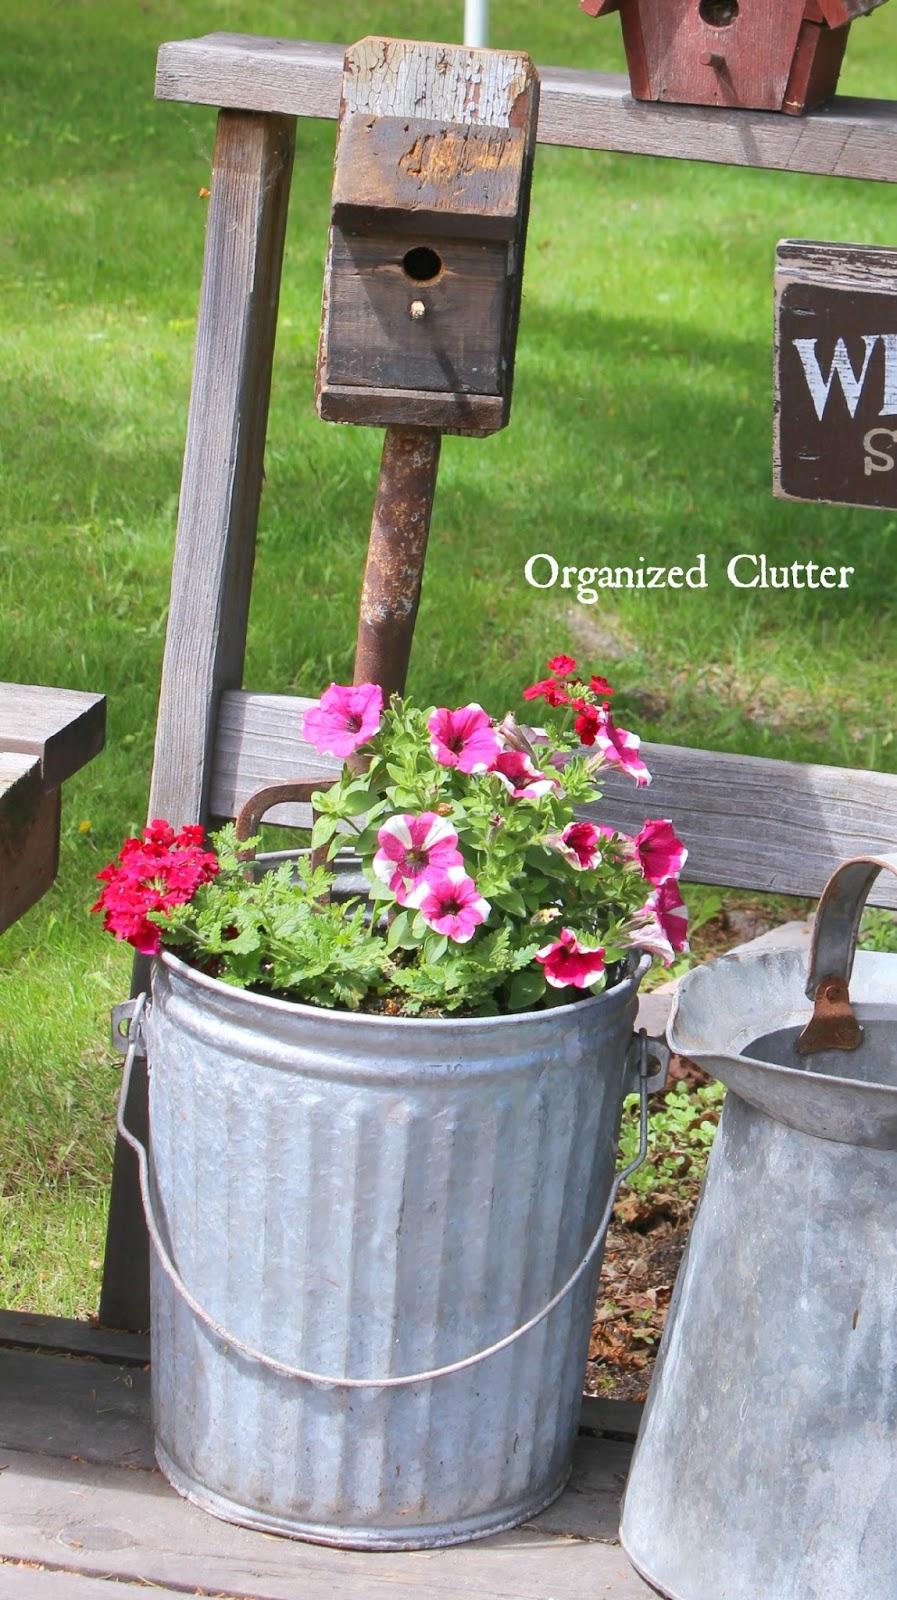 Garden Fork Birdhouse For Container Garden Www.organizedclutter.net